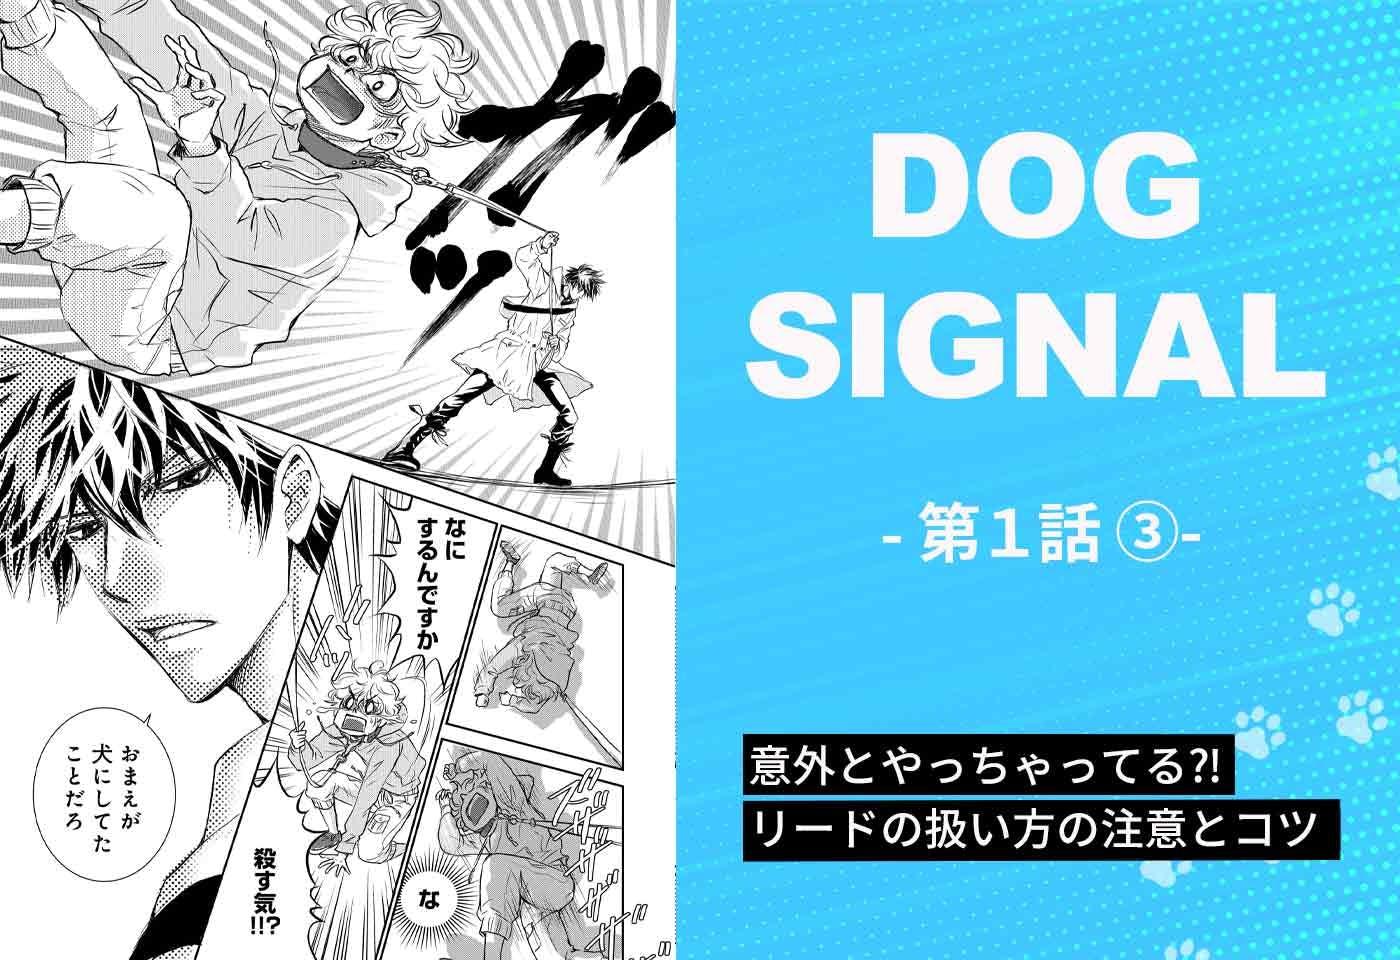 【新連載】『DOG SIGNAL』1話目 3/4